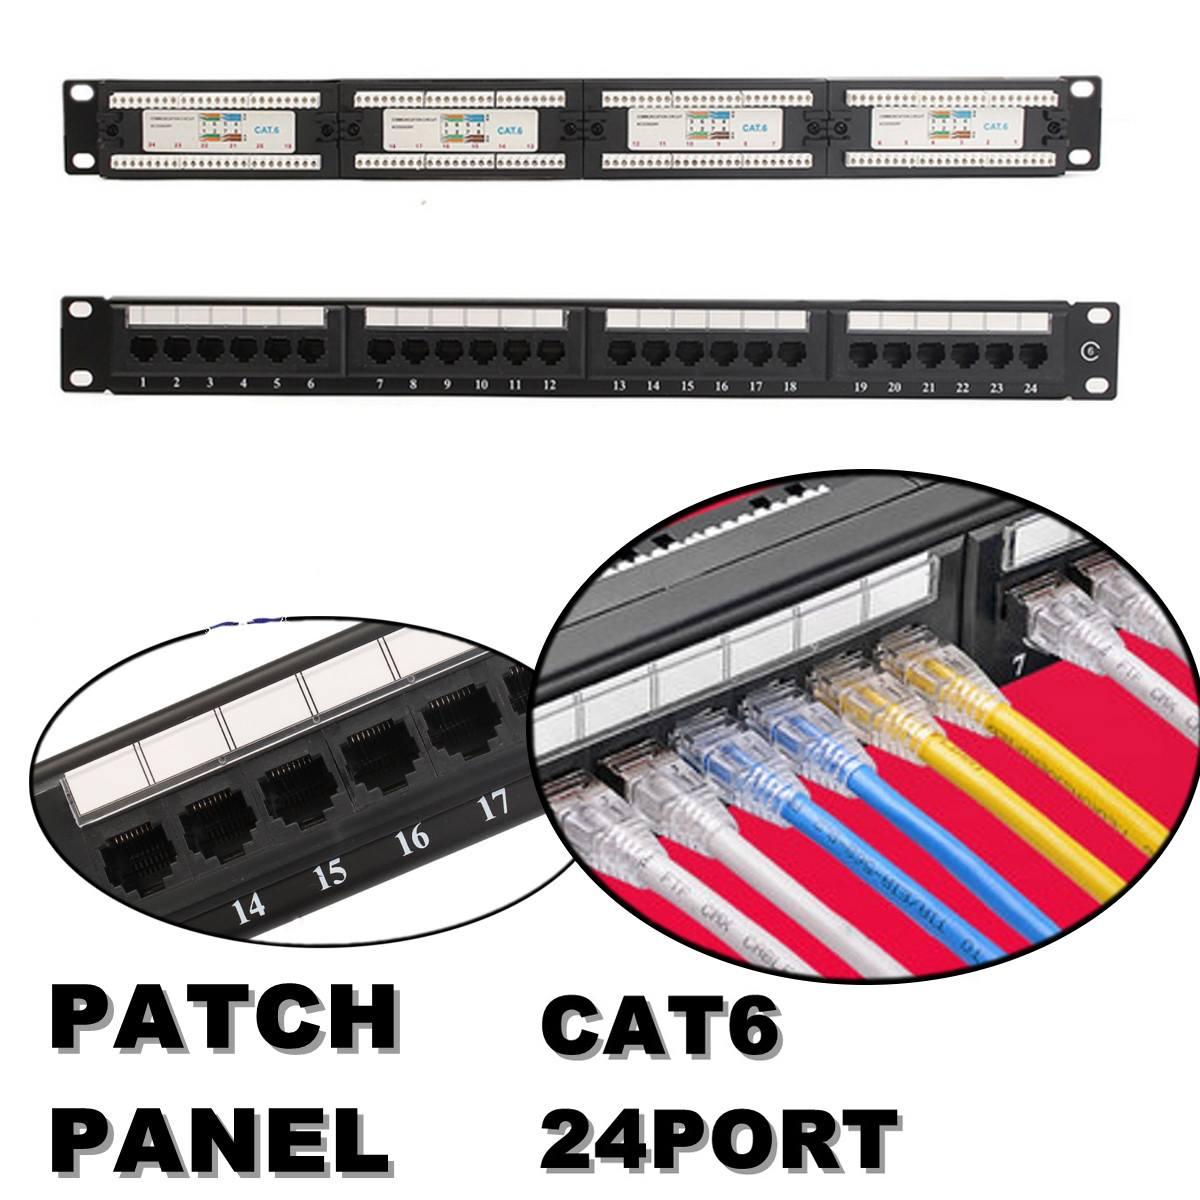 24-Port CAT6 1U UTP Patch Panel 19-Inch Network Lan Rackmount Wallmount TO